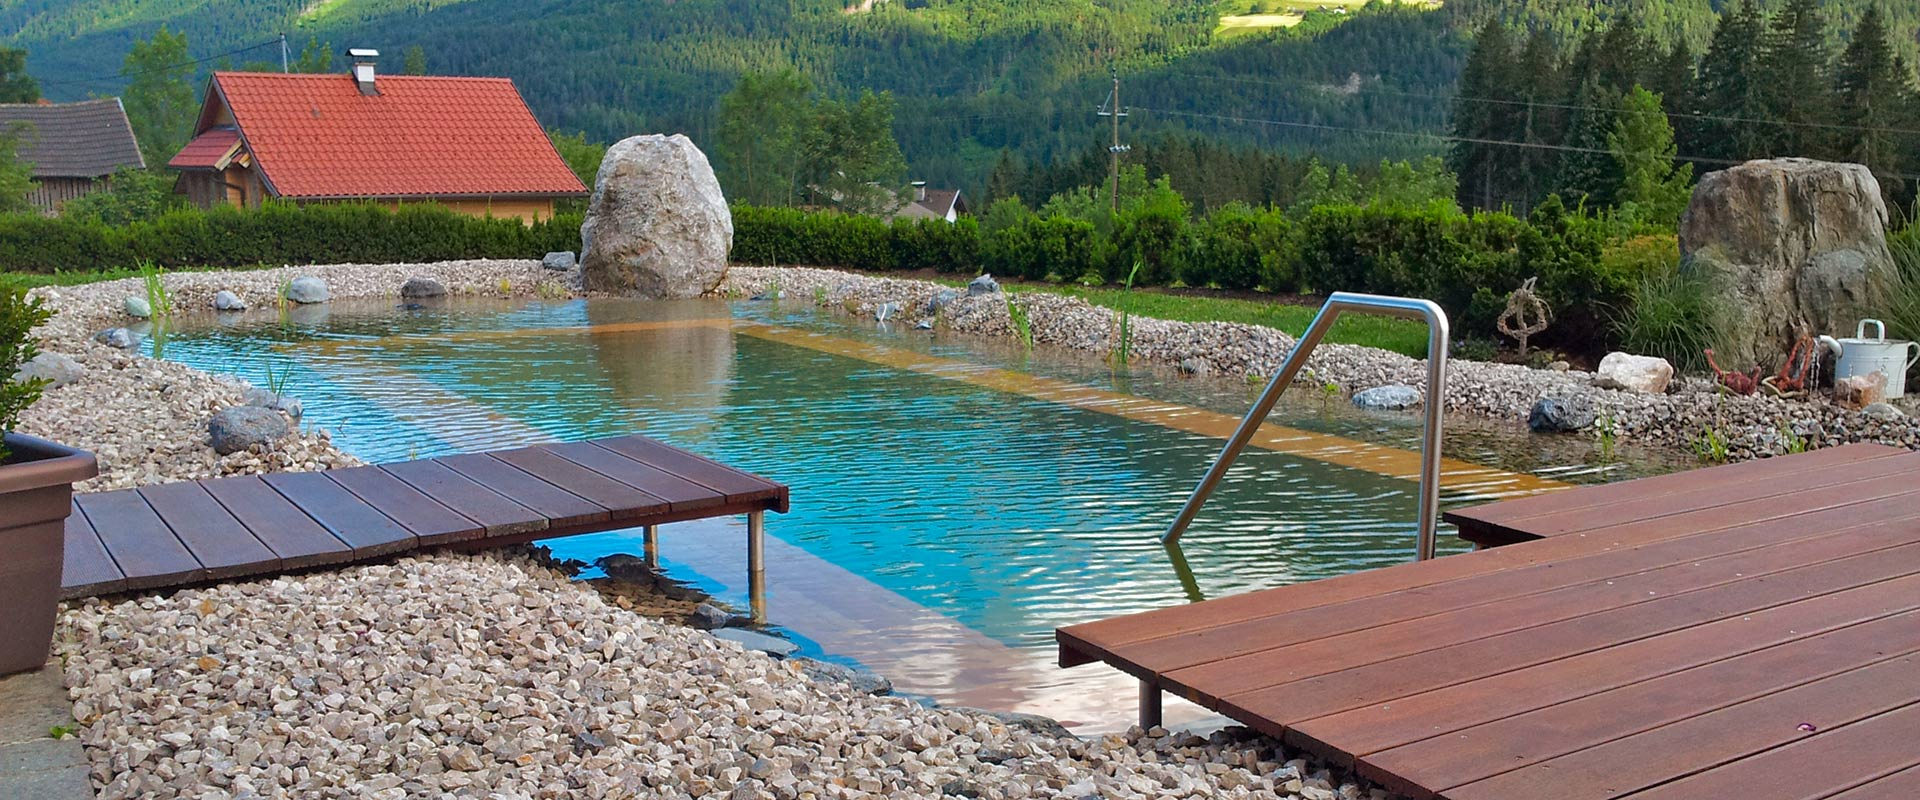 holc naturpool swimmingpool aus holz einbauen